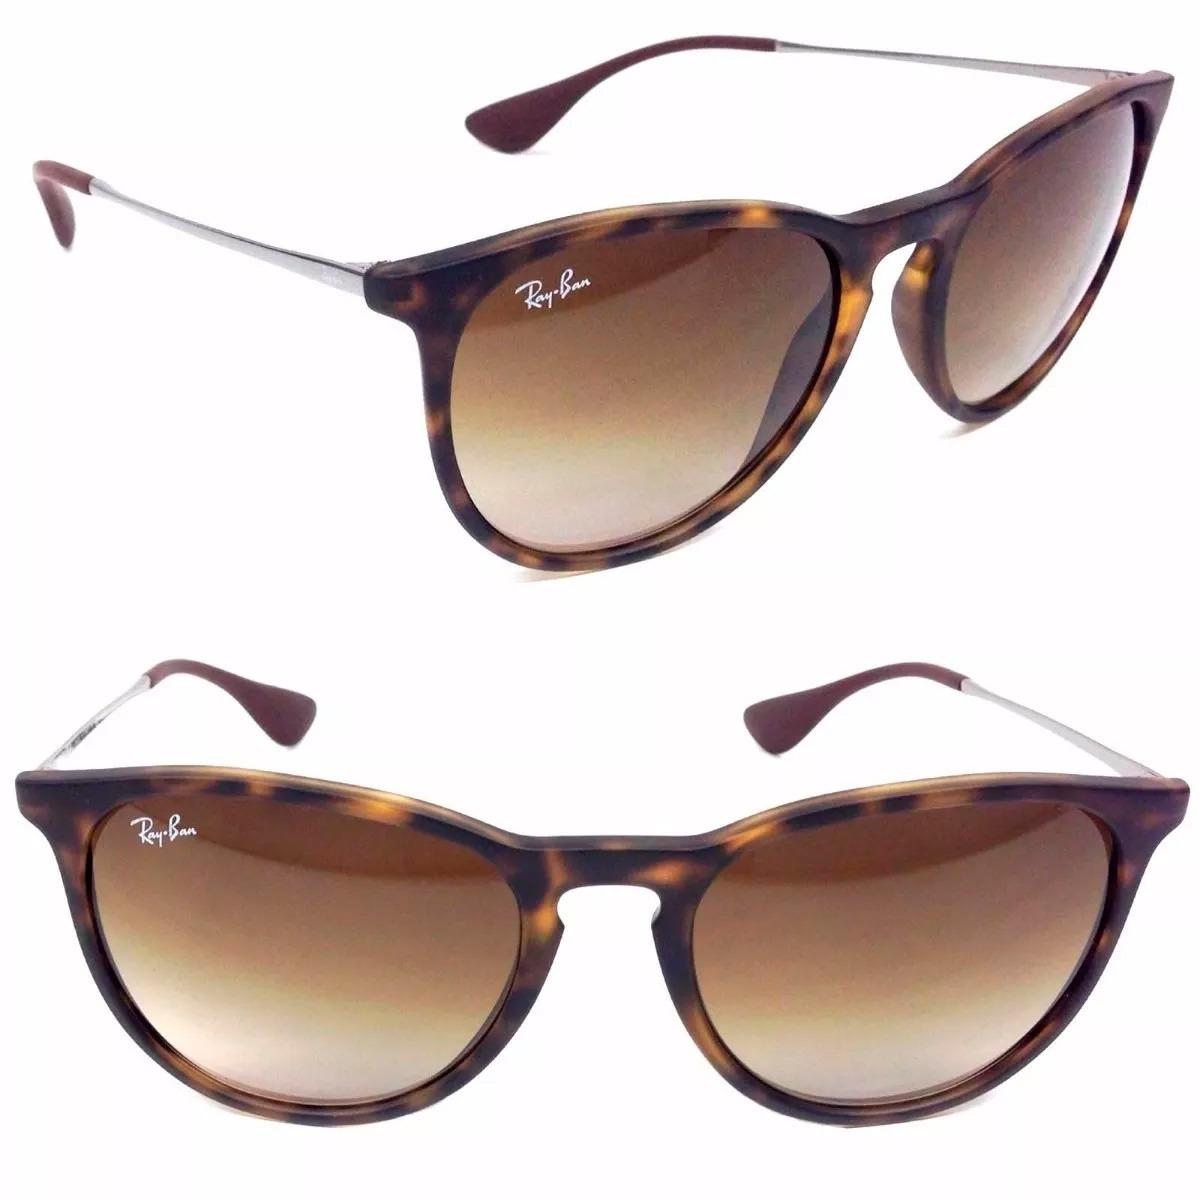 c387e8e38 óculos de sol ray-ban rb4171 erika original marrom tartaruga. Carregando  zoom.